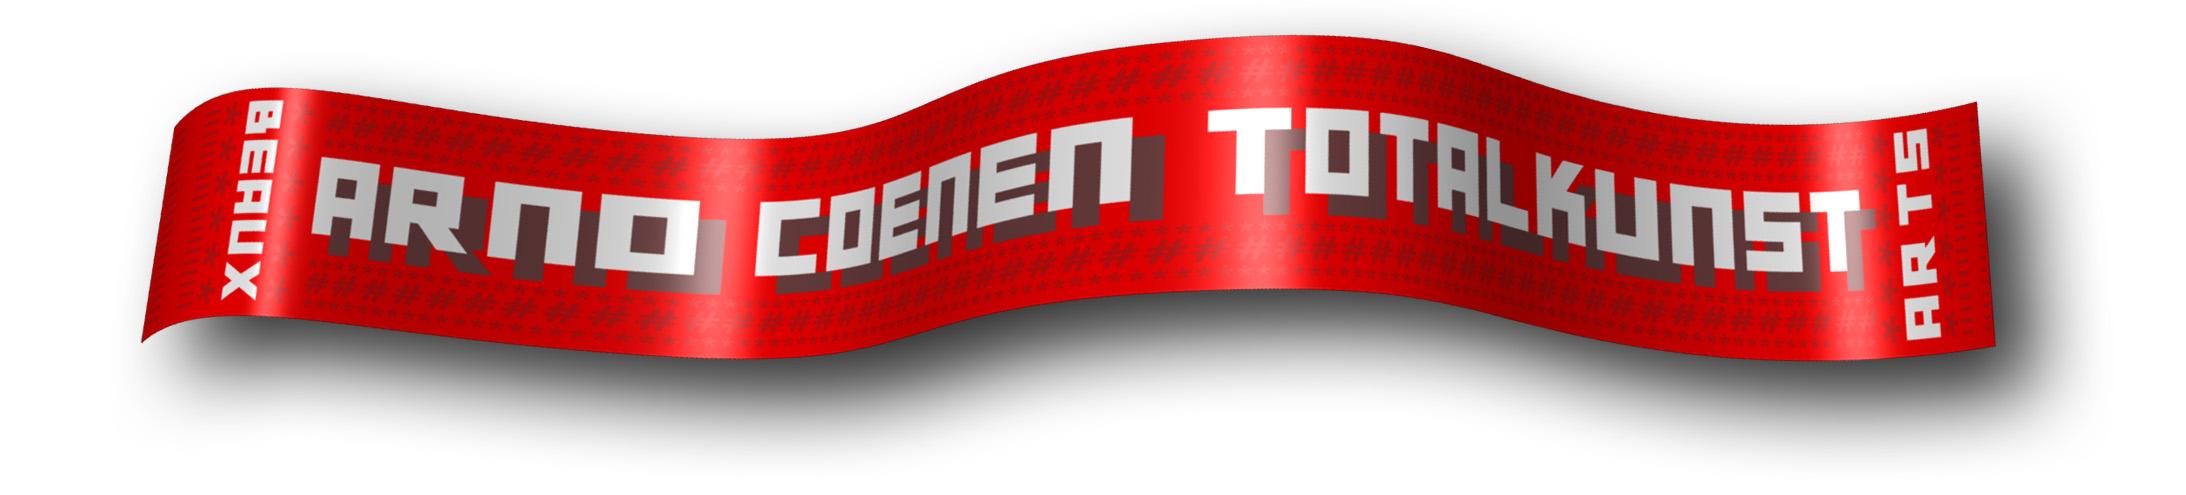 Arno Coenen Totalkunst logo